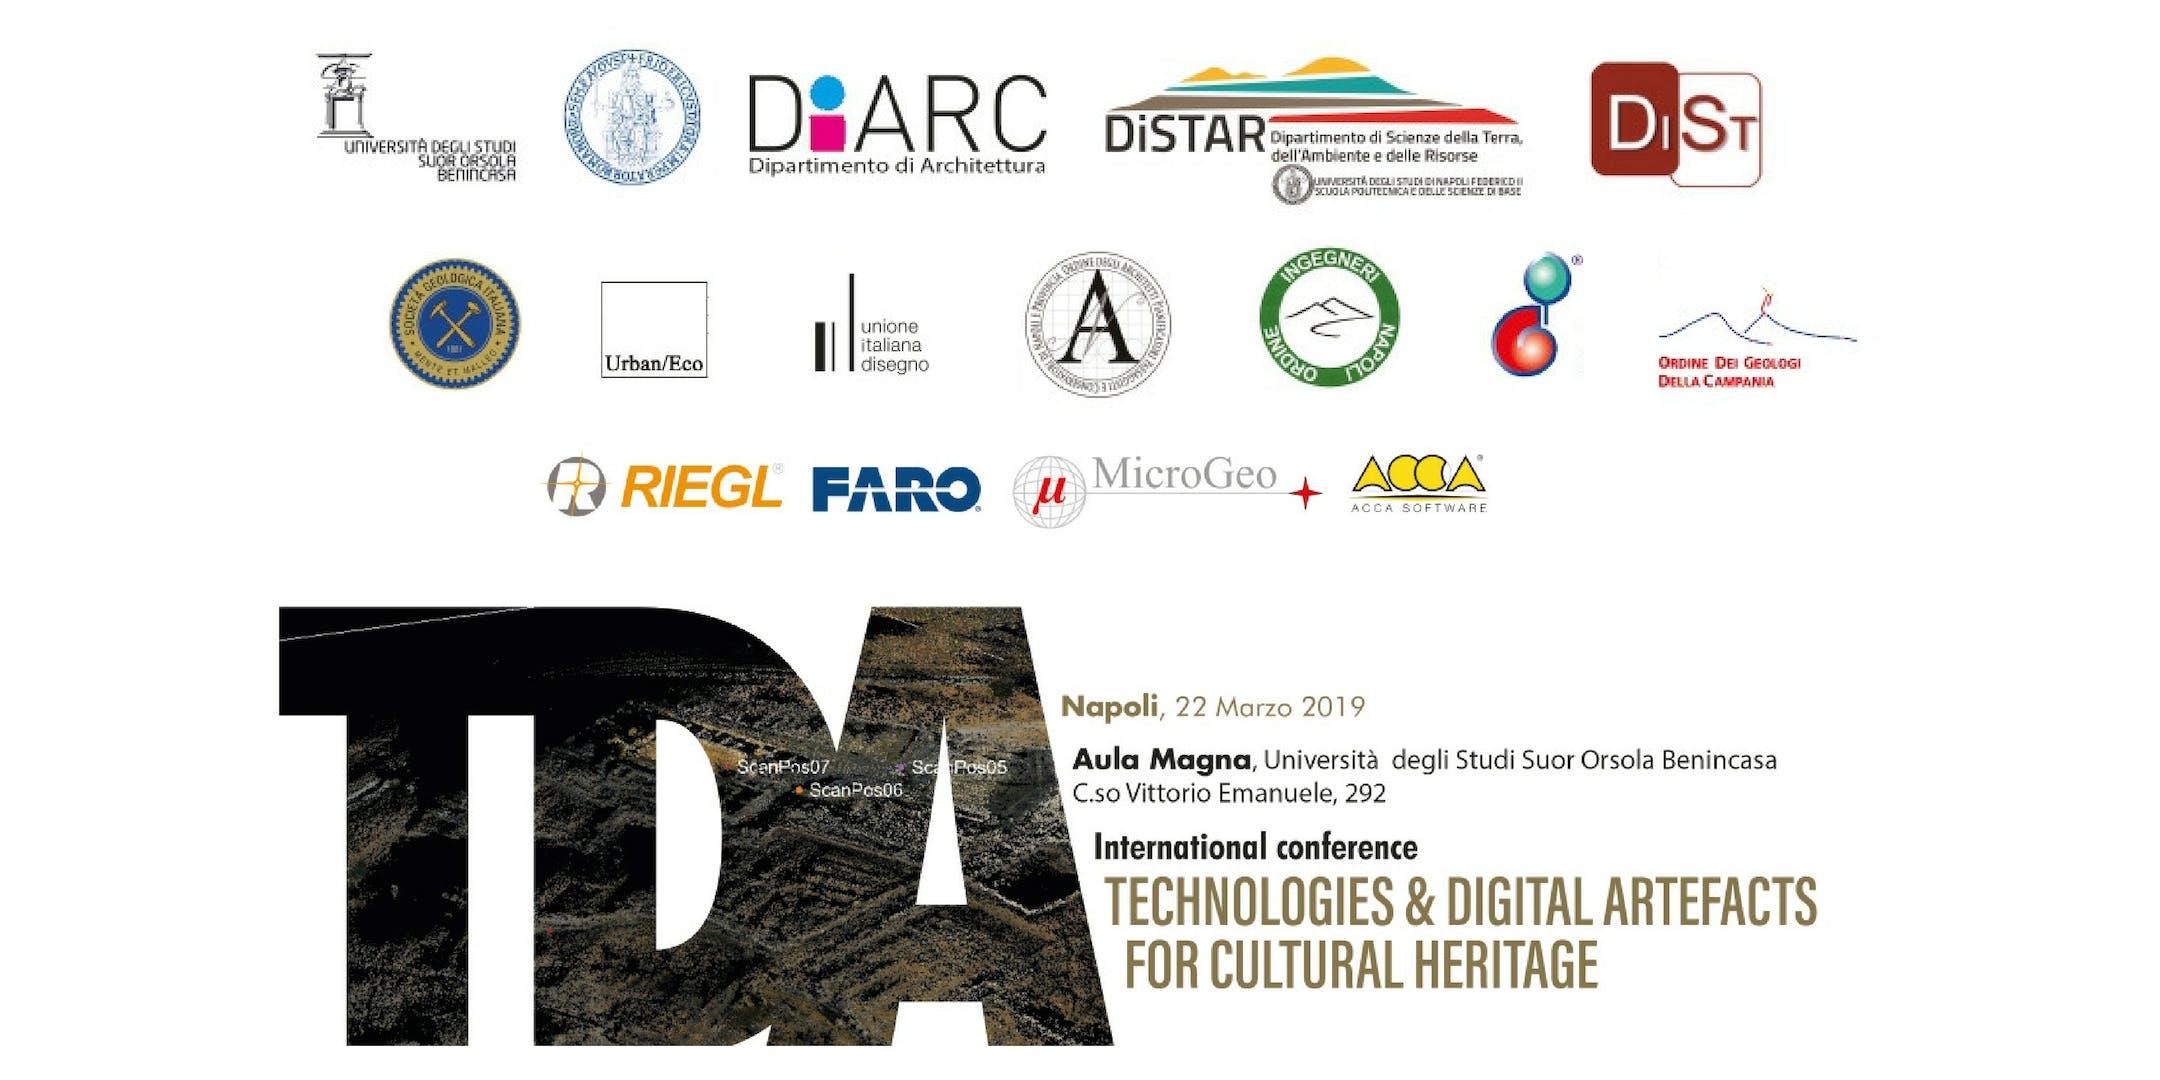 Technologies & Digital Artefacts for Cultural